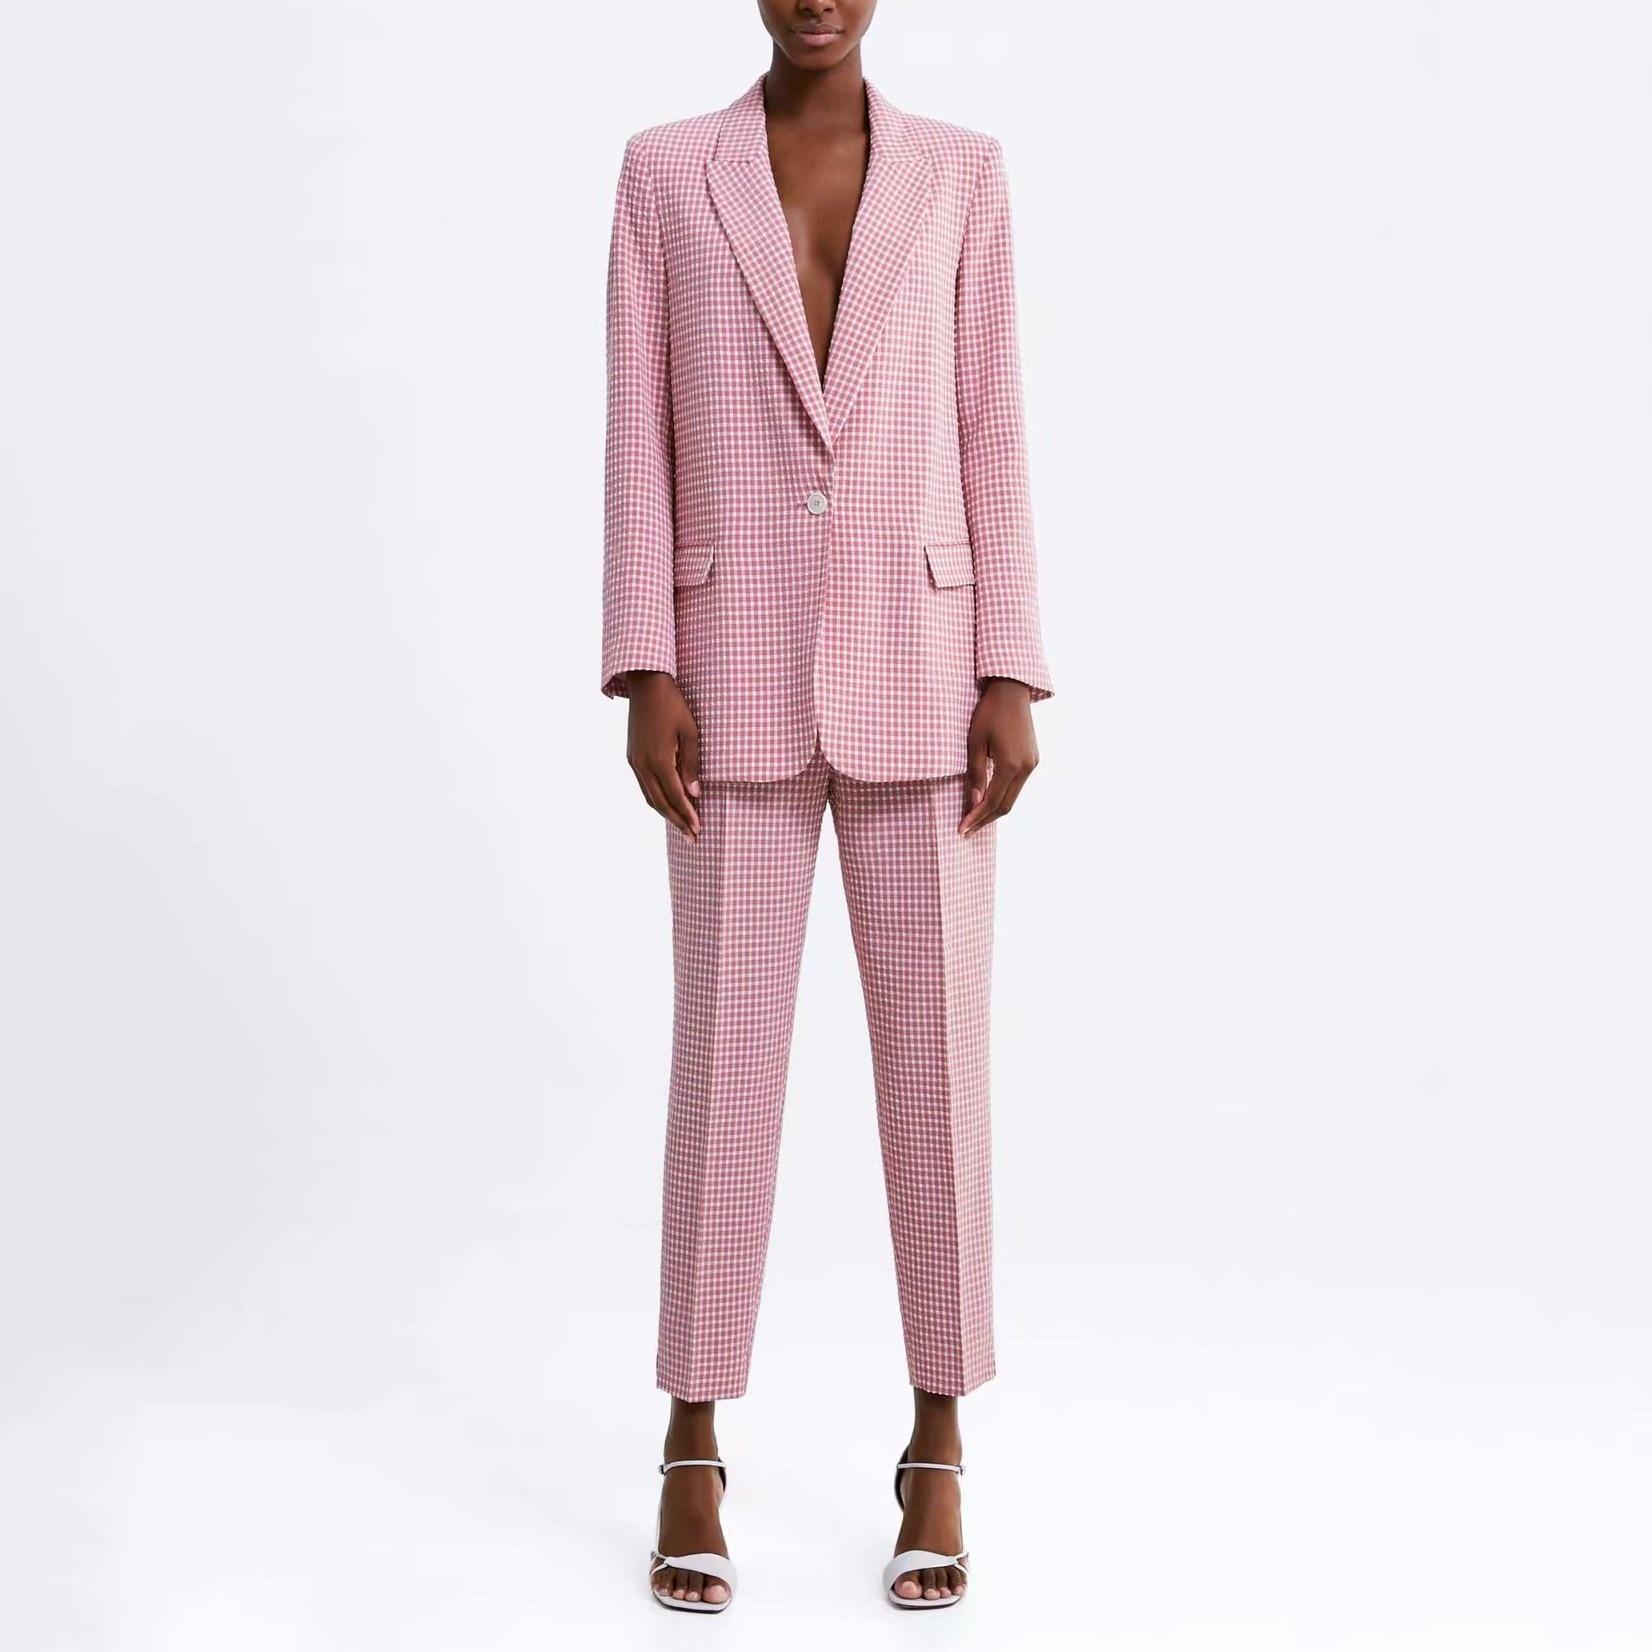 Casual Plaid Two Pieces Set Women Pant Suits Clothes 2019 Spring Summer Button Blazers Coats And Pants Pant Suits